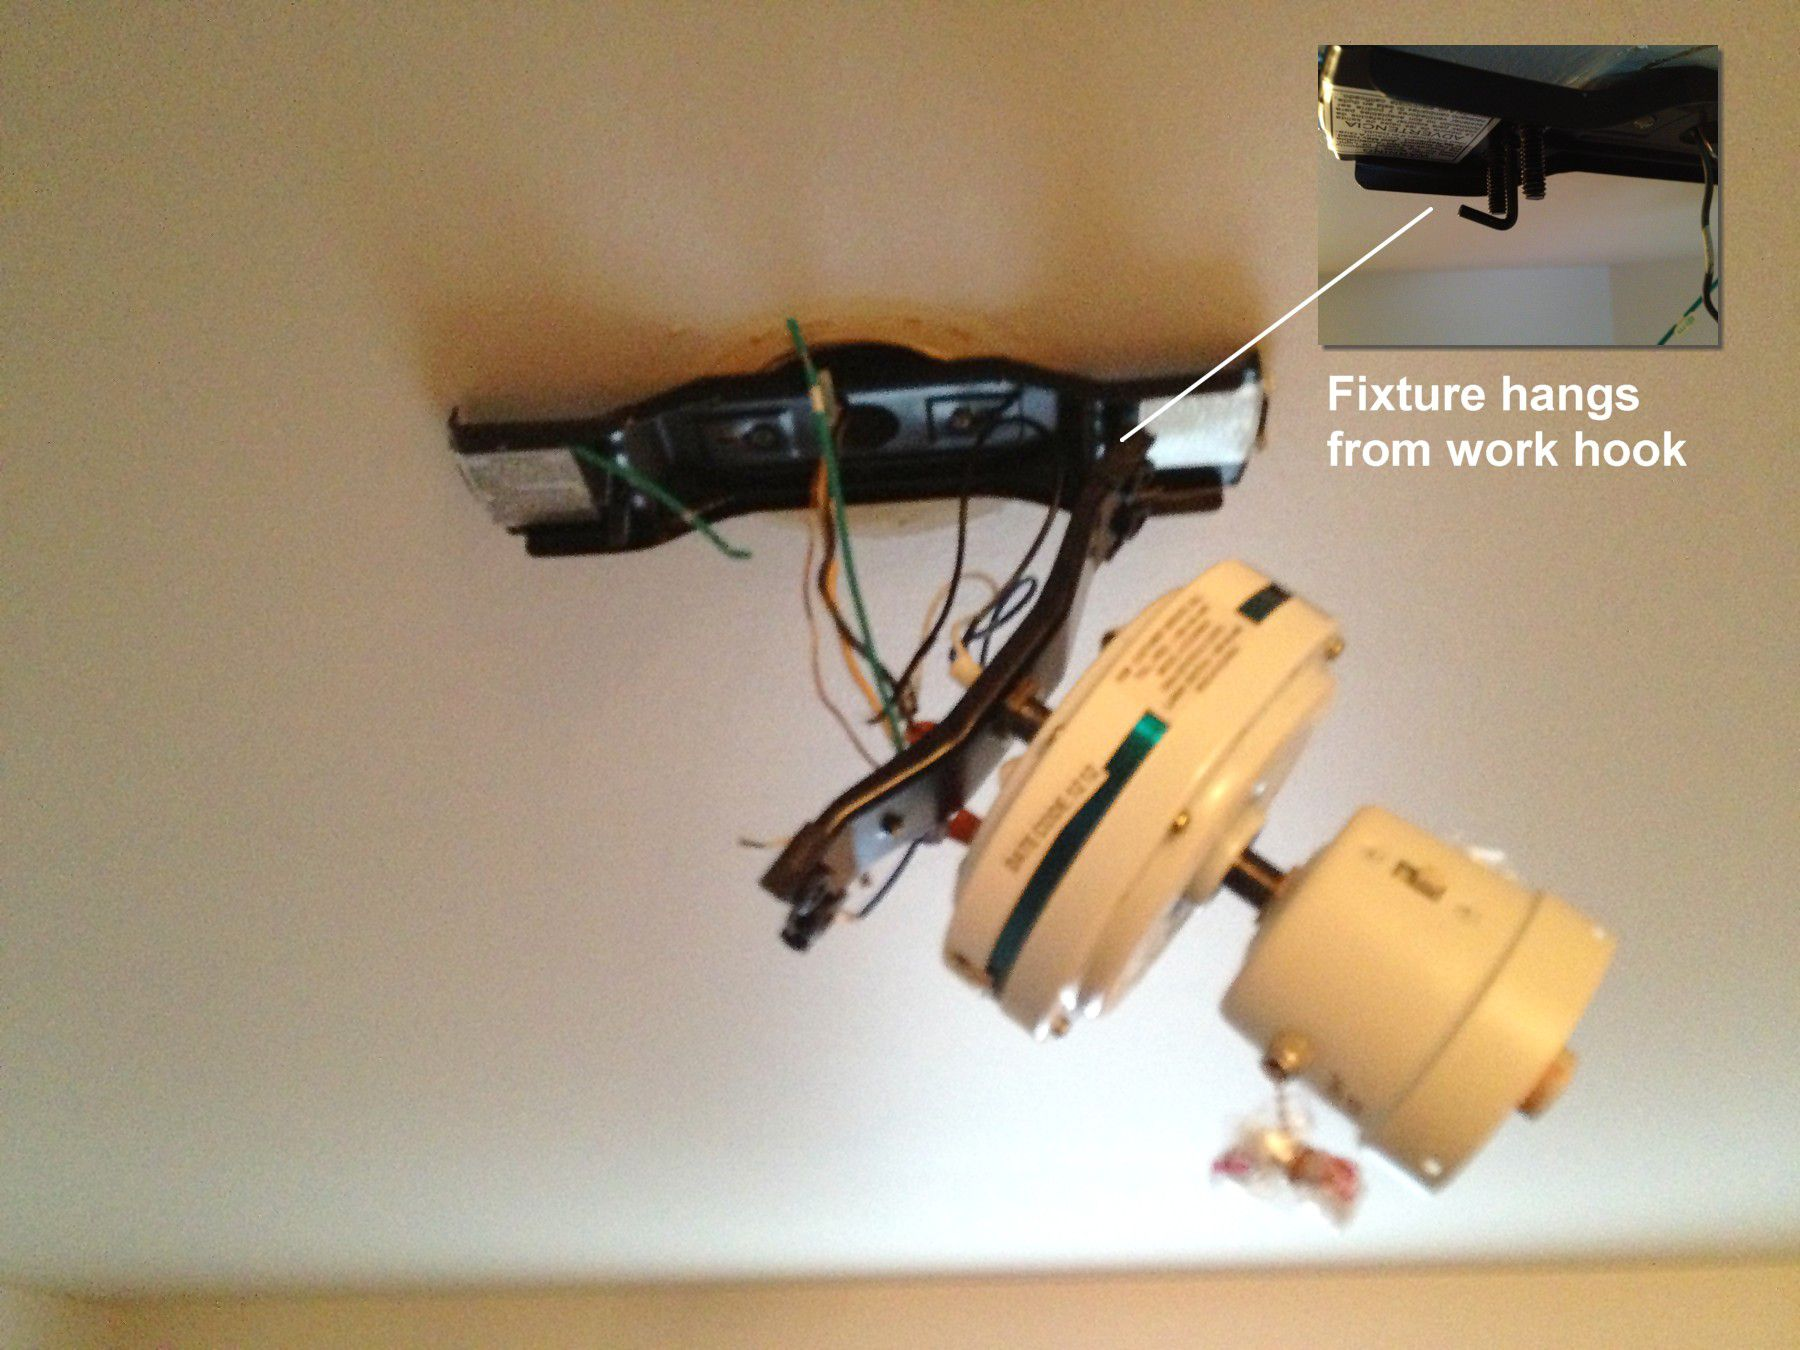 Get Help Installing A Ceiling Fan Re Advice On Wiring Electric Fans